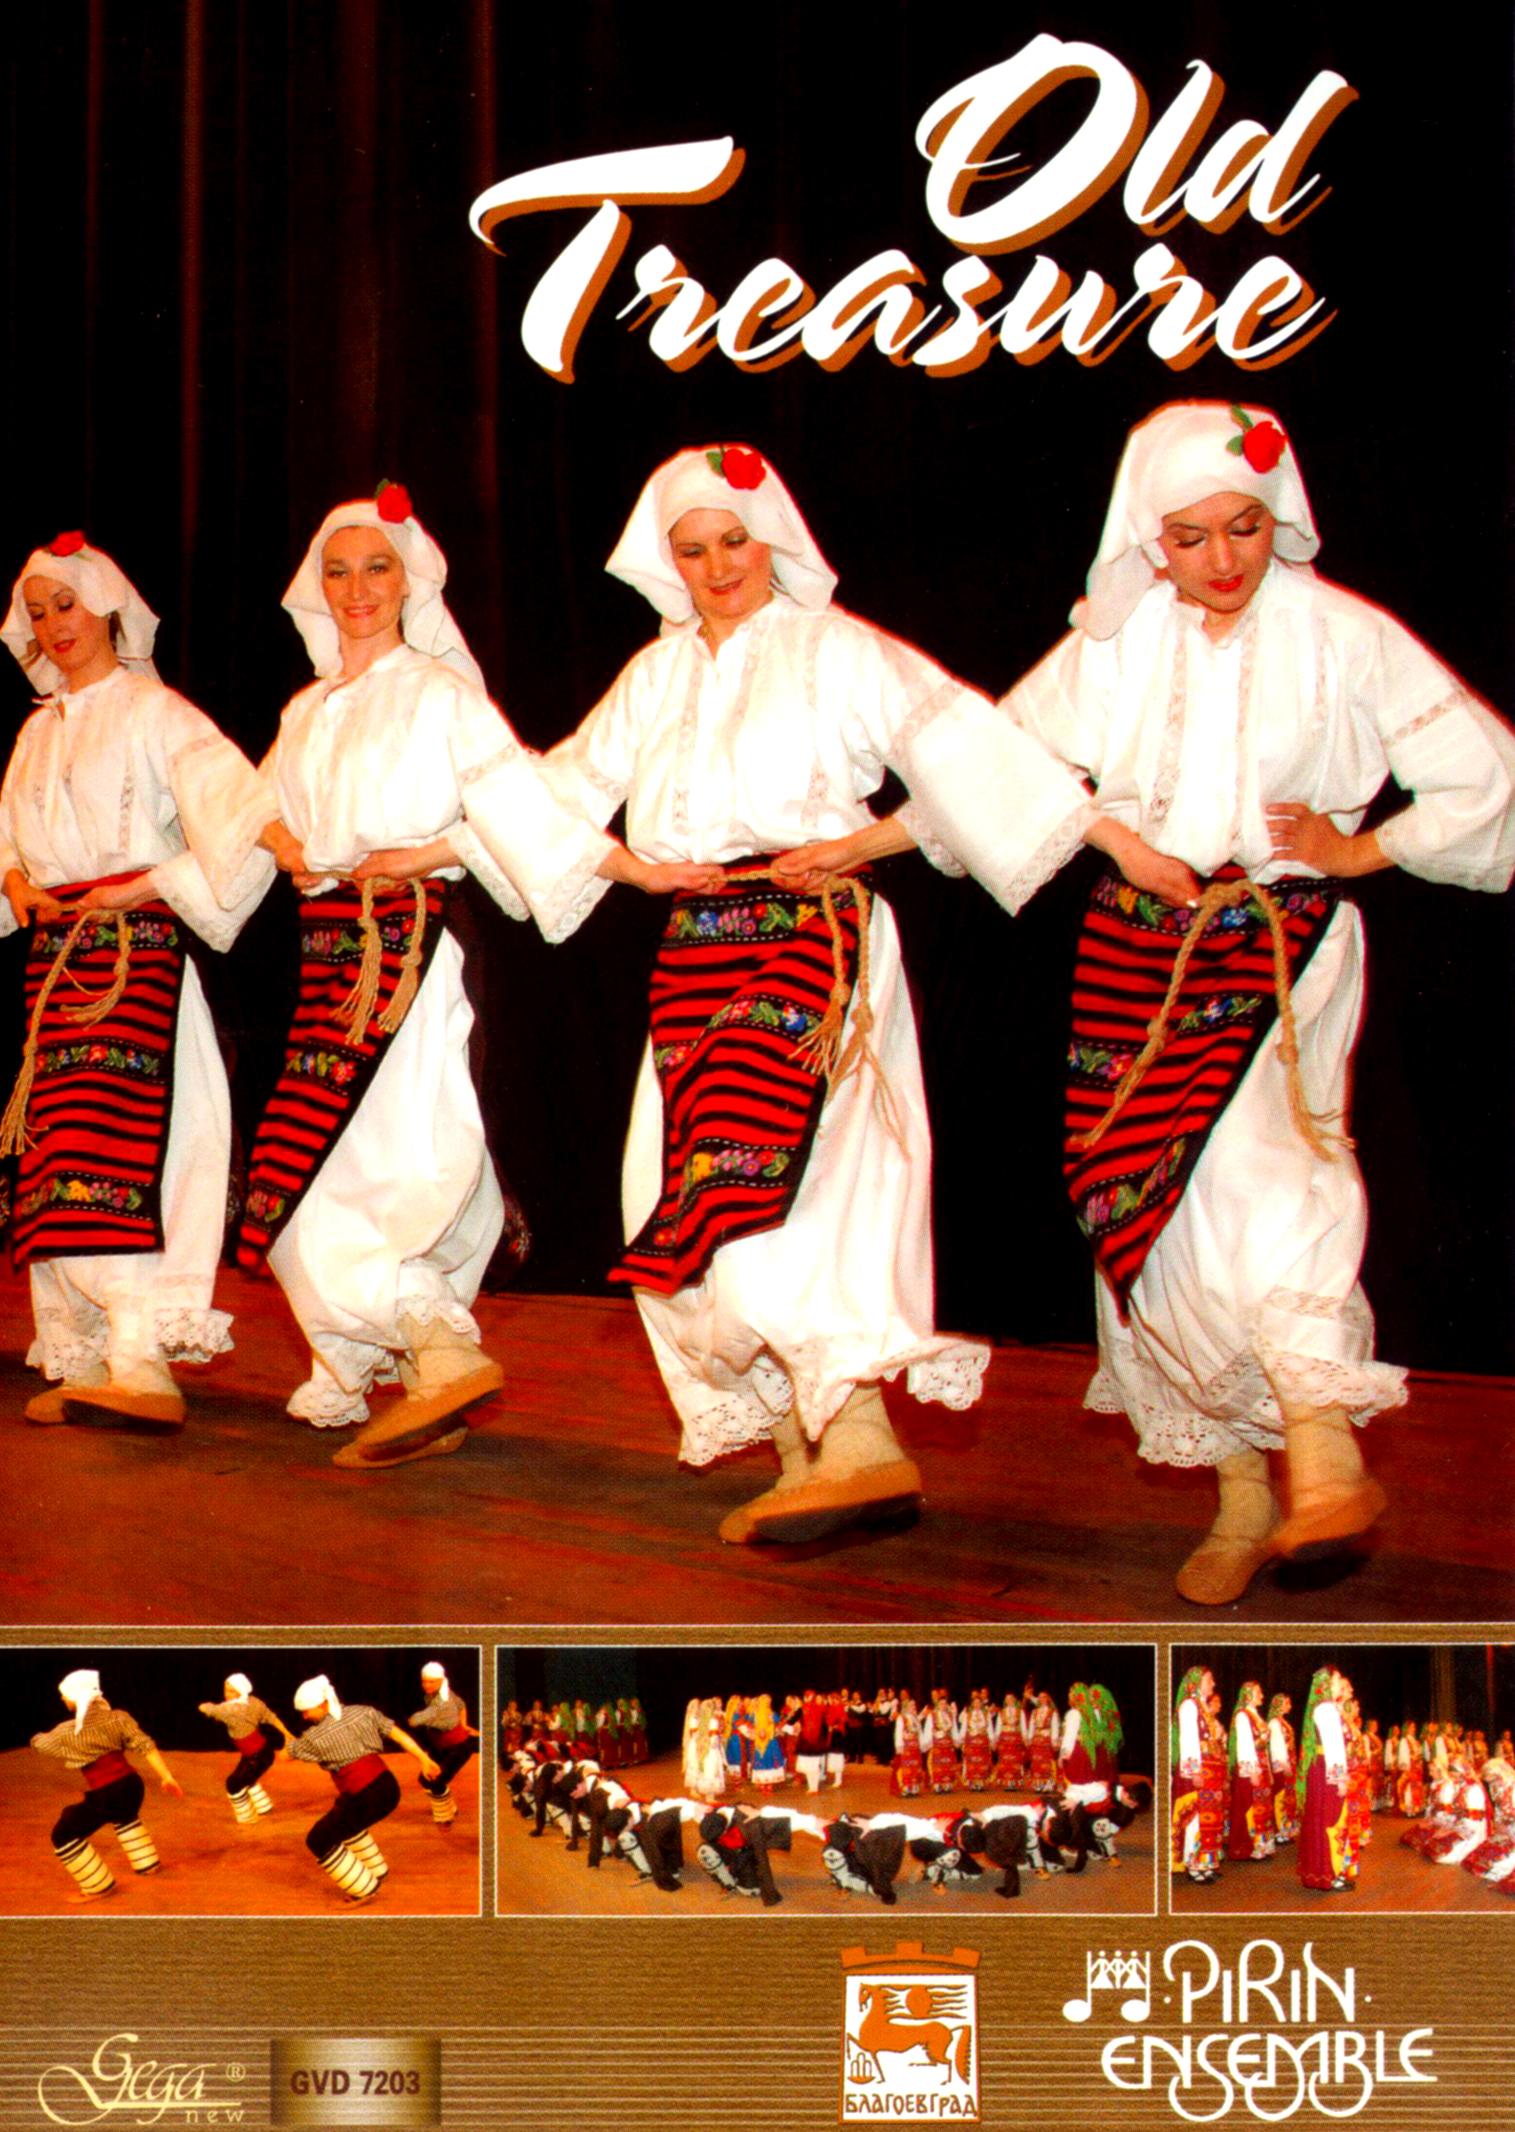 Pirin Ensemble: Old Treasure